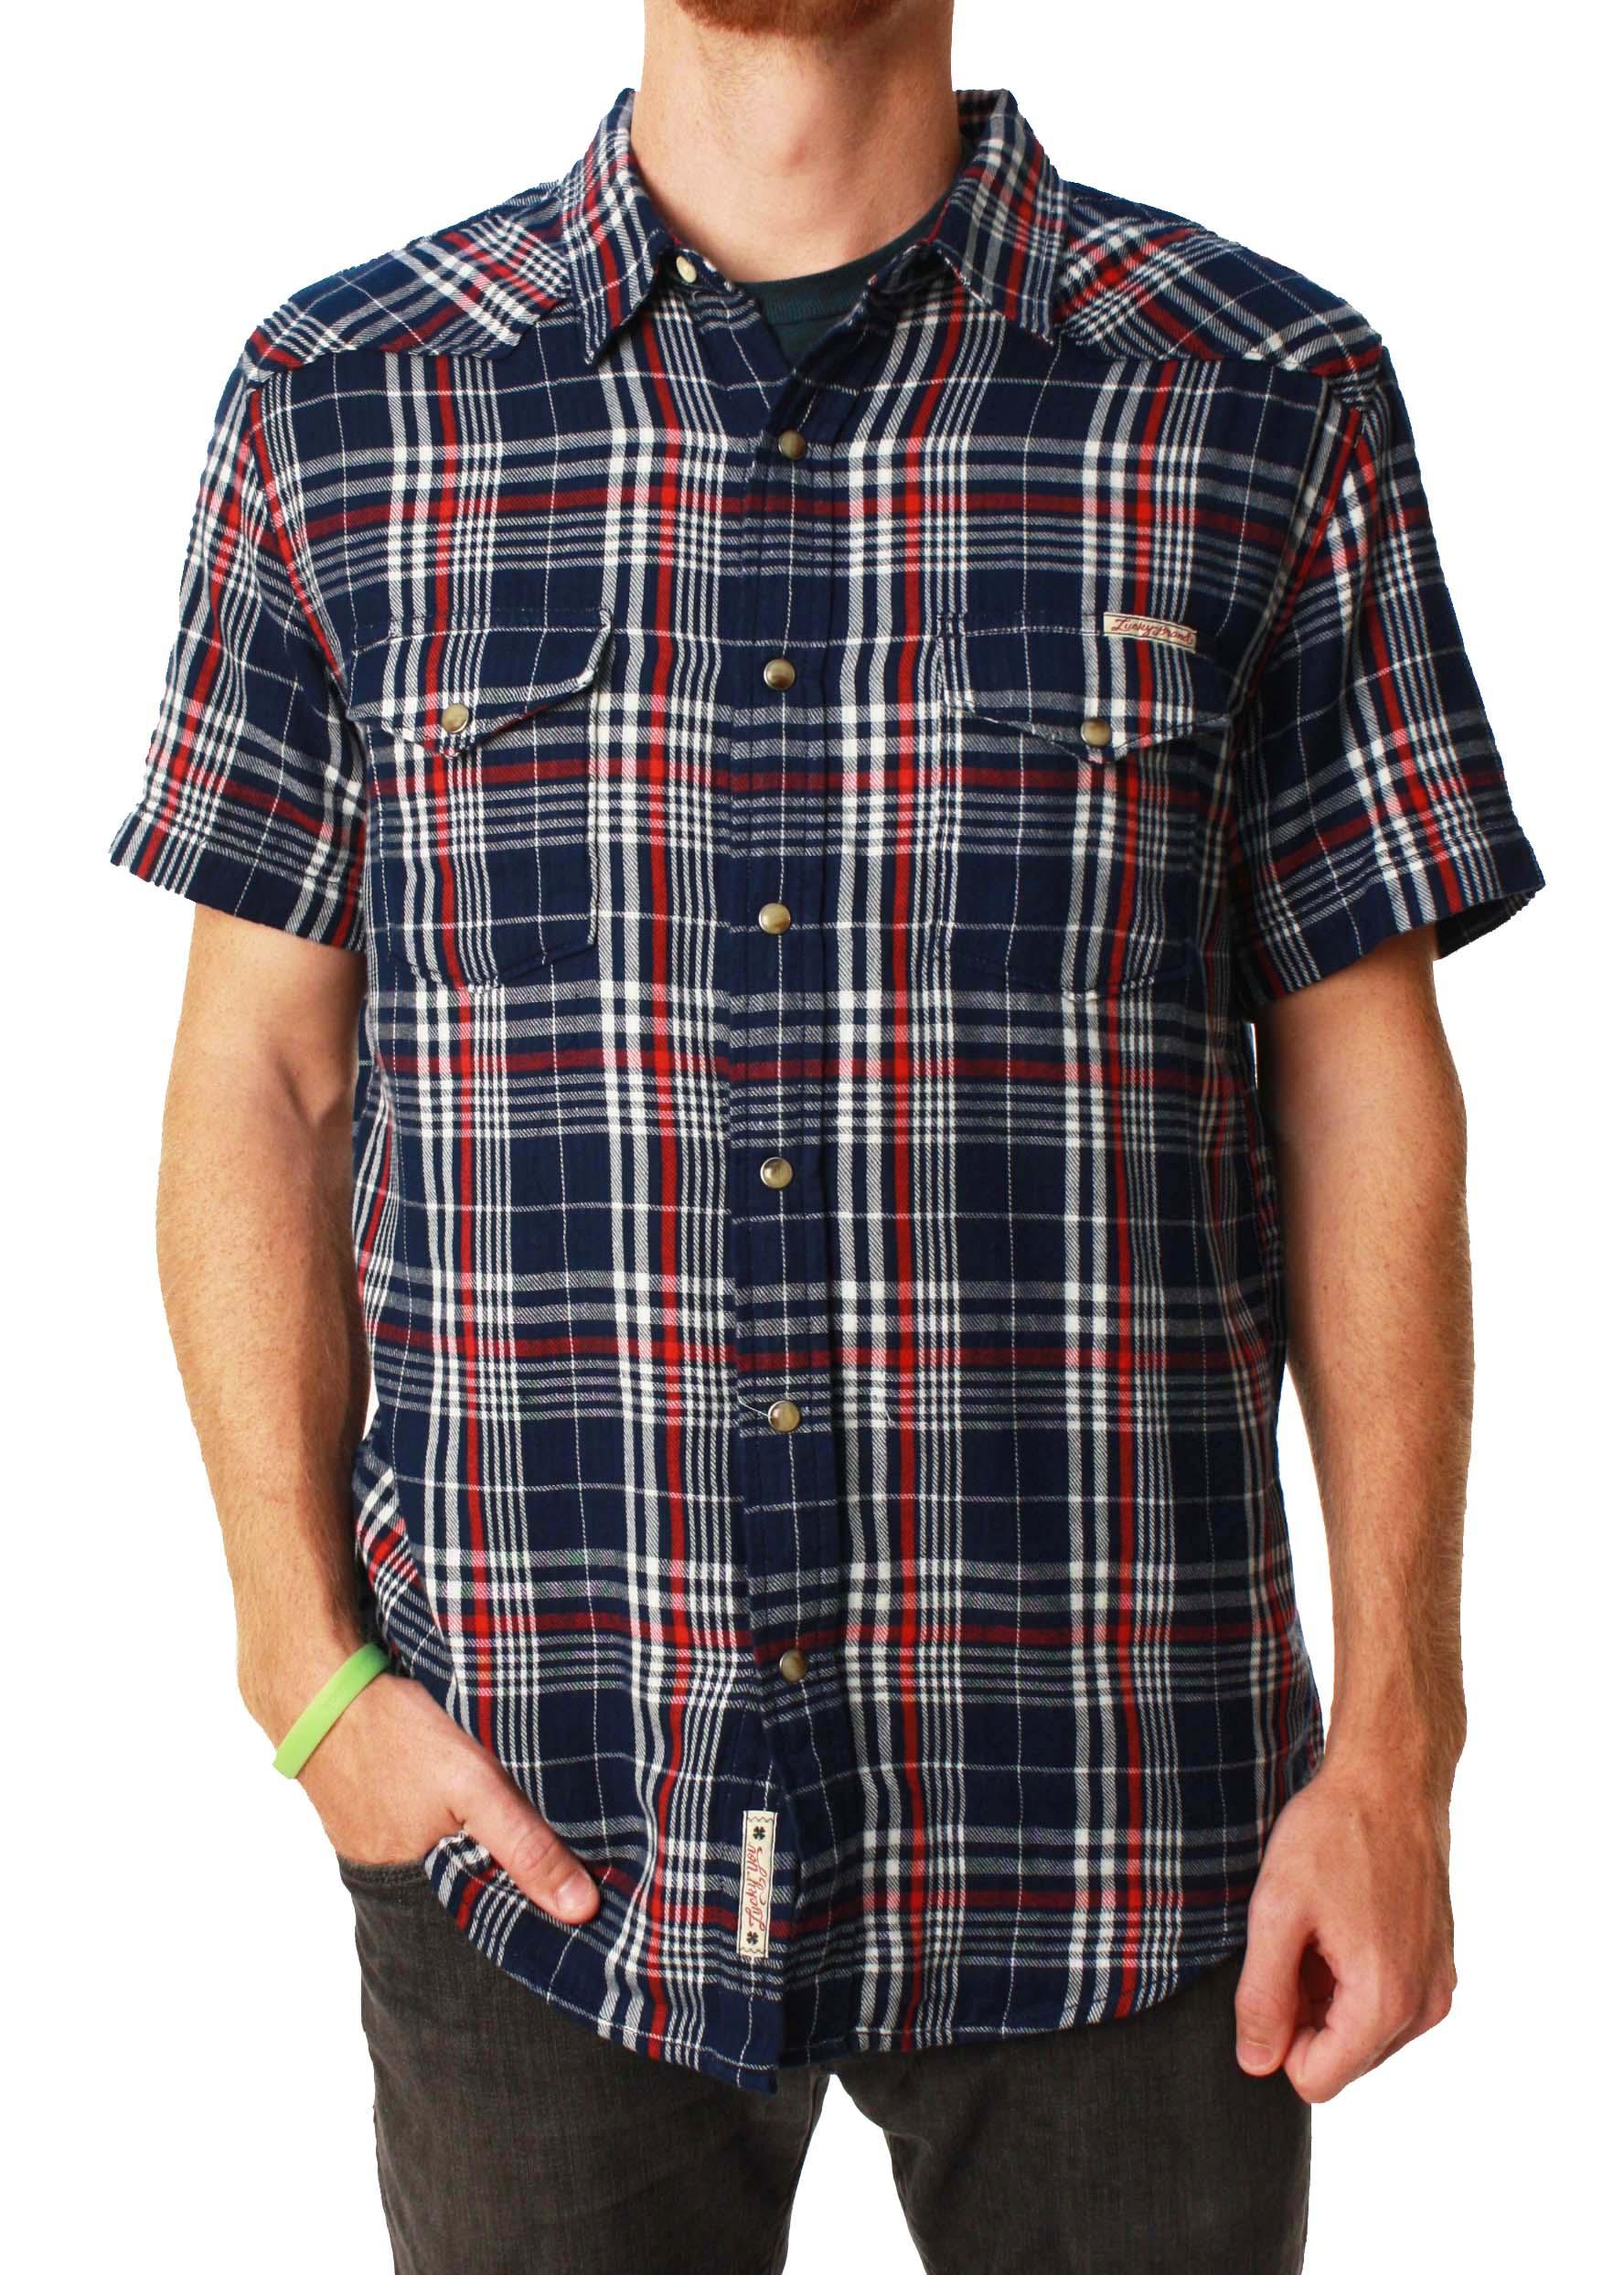 Lucky Brand Men's Western Sportswear Short Sleeve Button Up Flannel Shirt at Sears.com